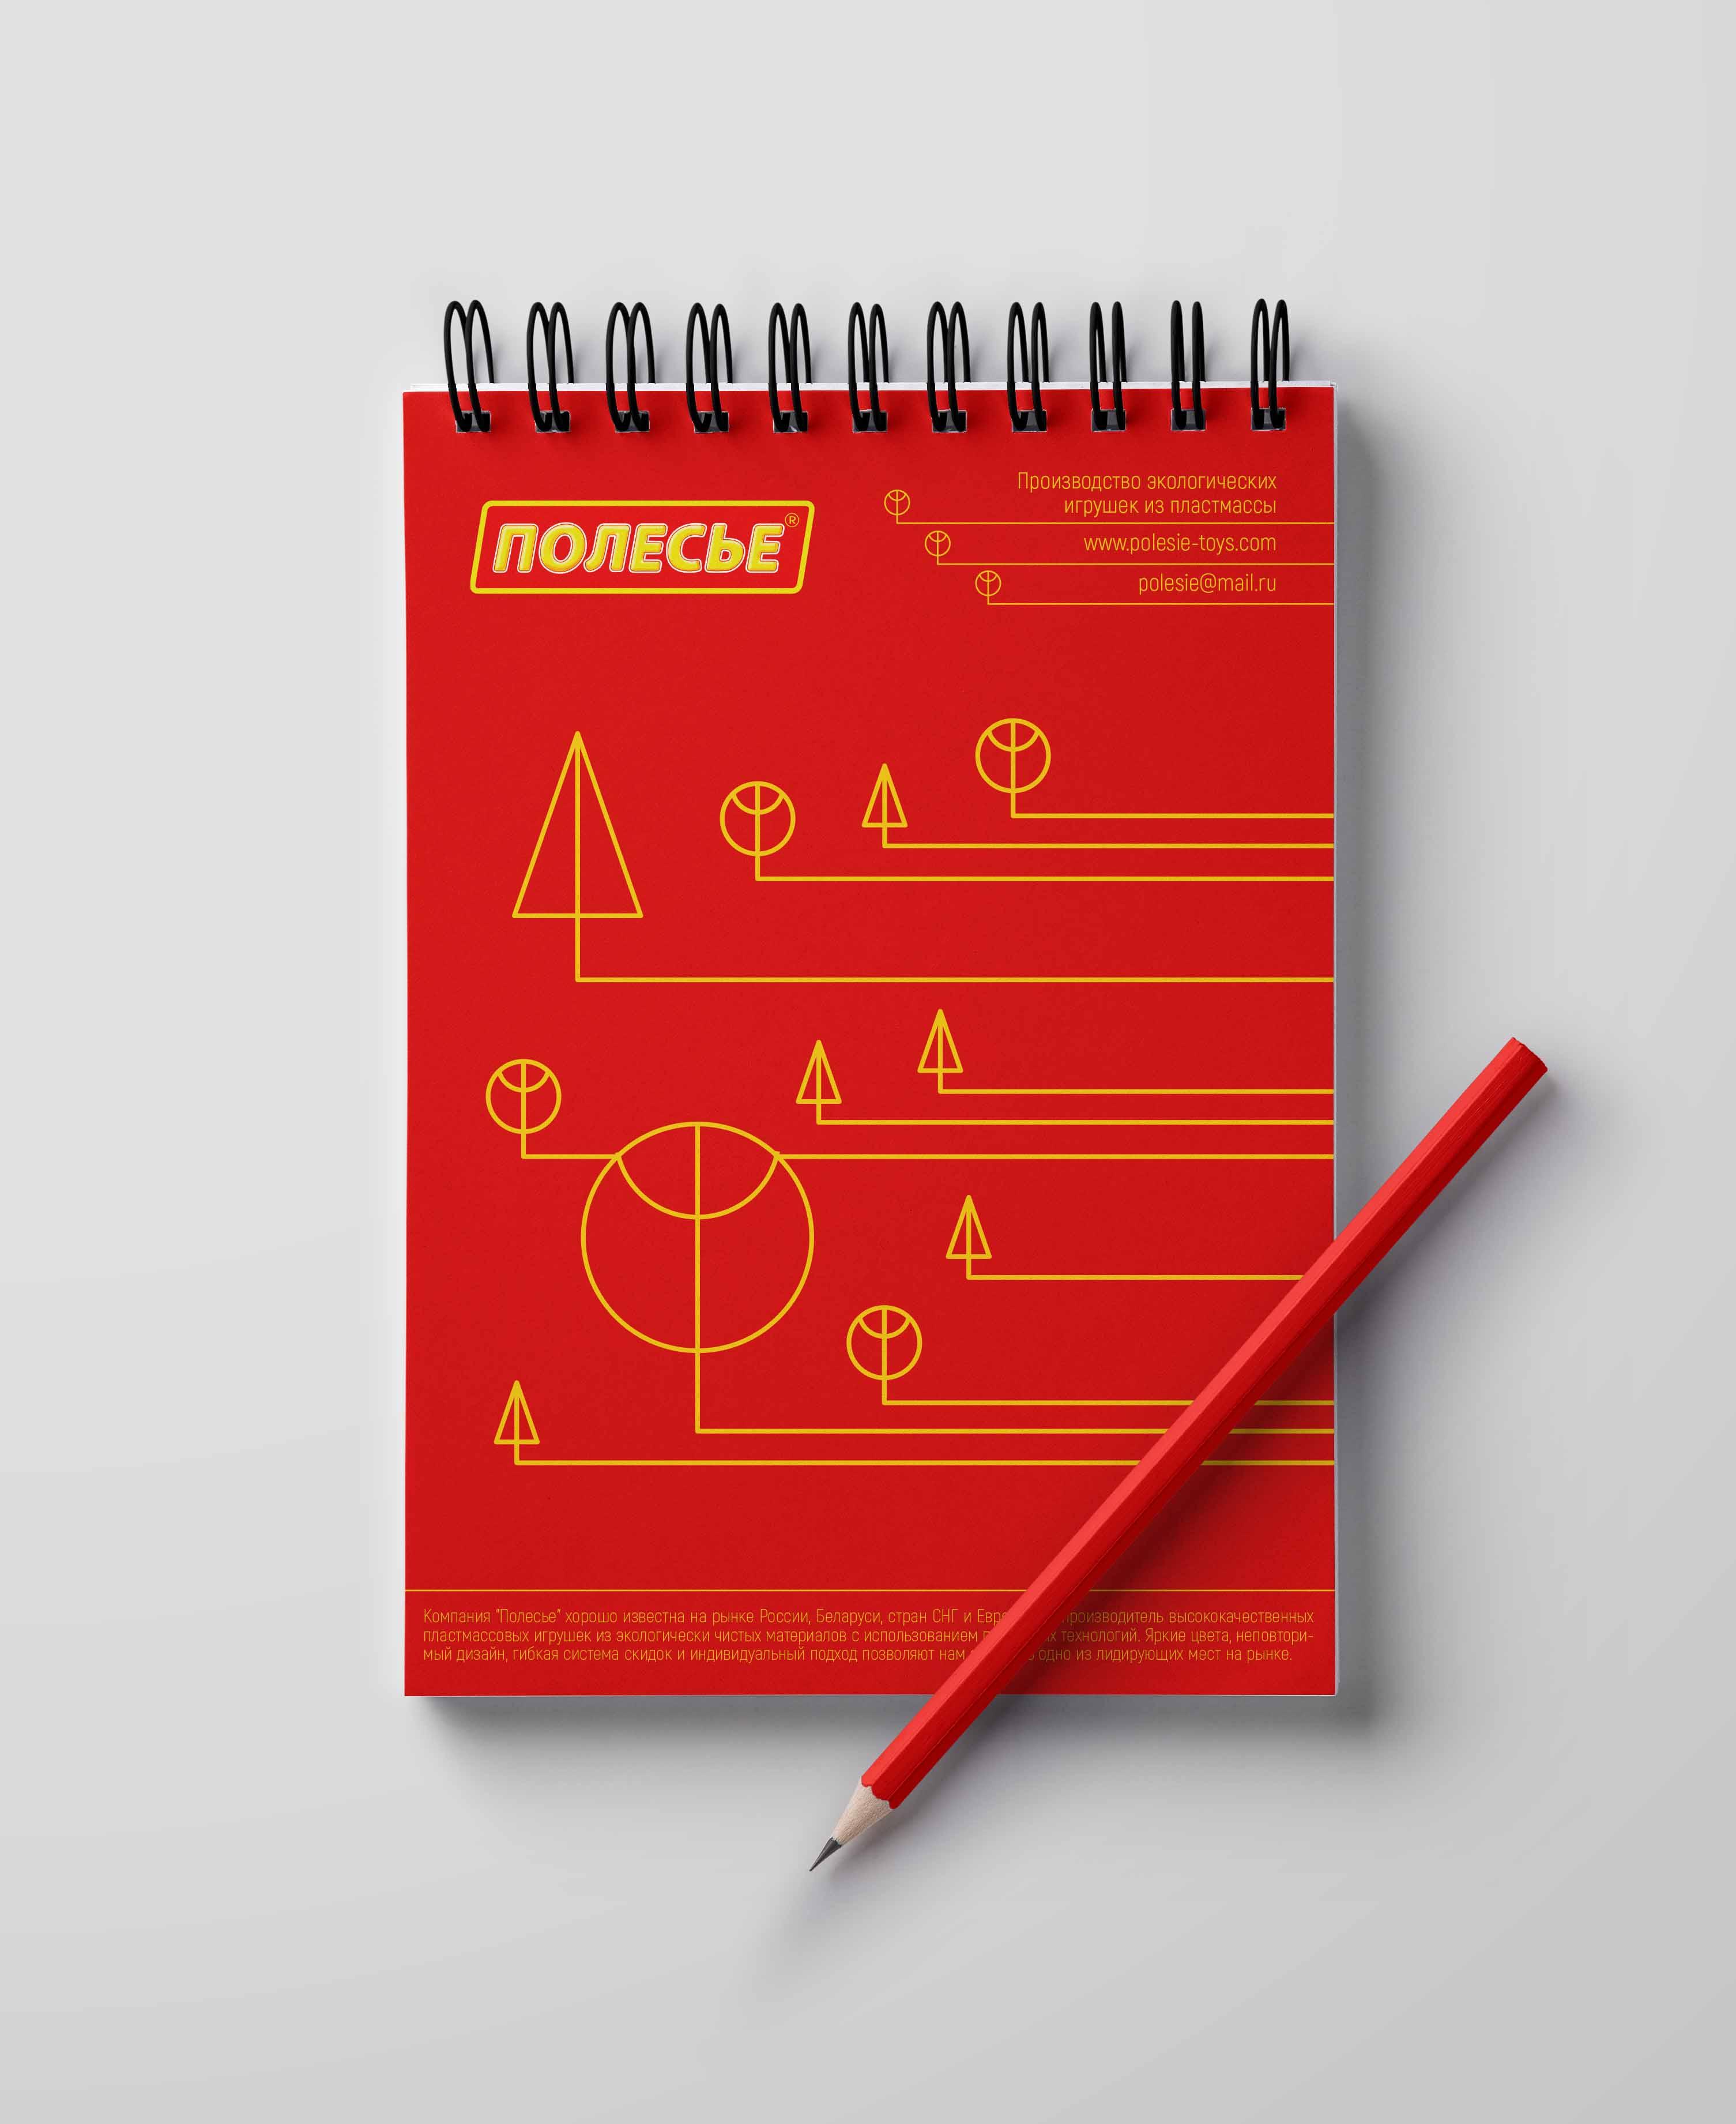 Разработка фирменного стиля на основании готового логотипа фото f_0105aa664c517060.jpg